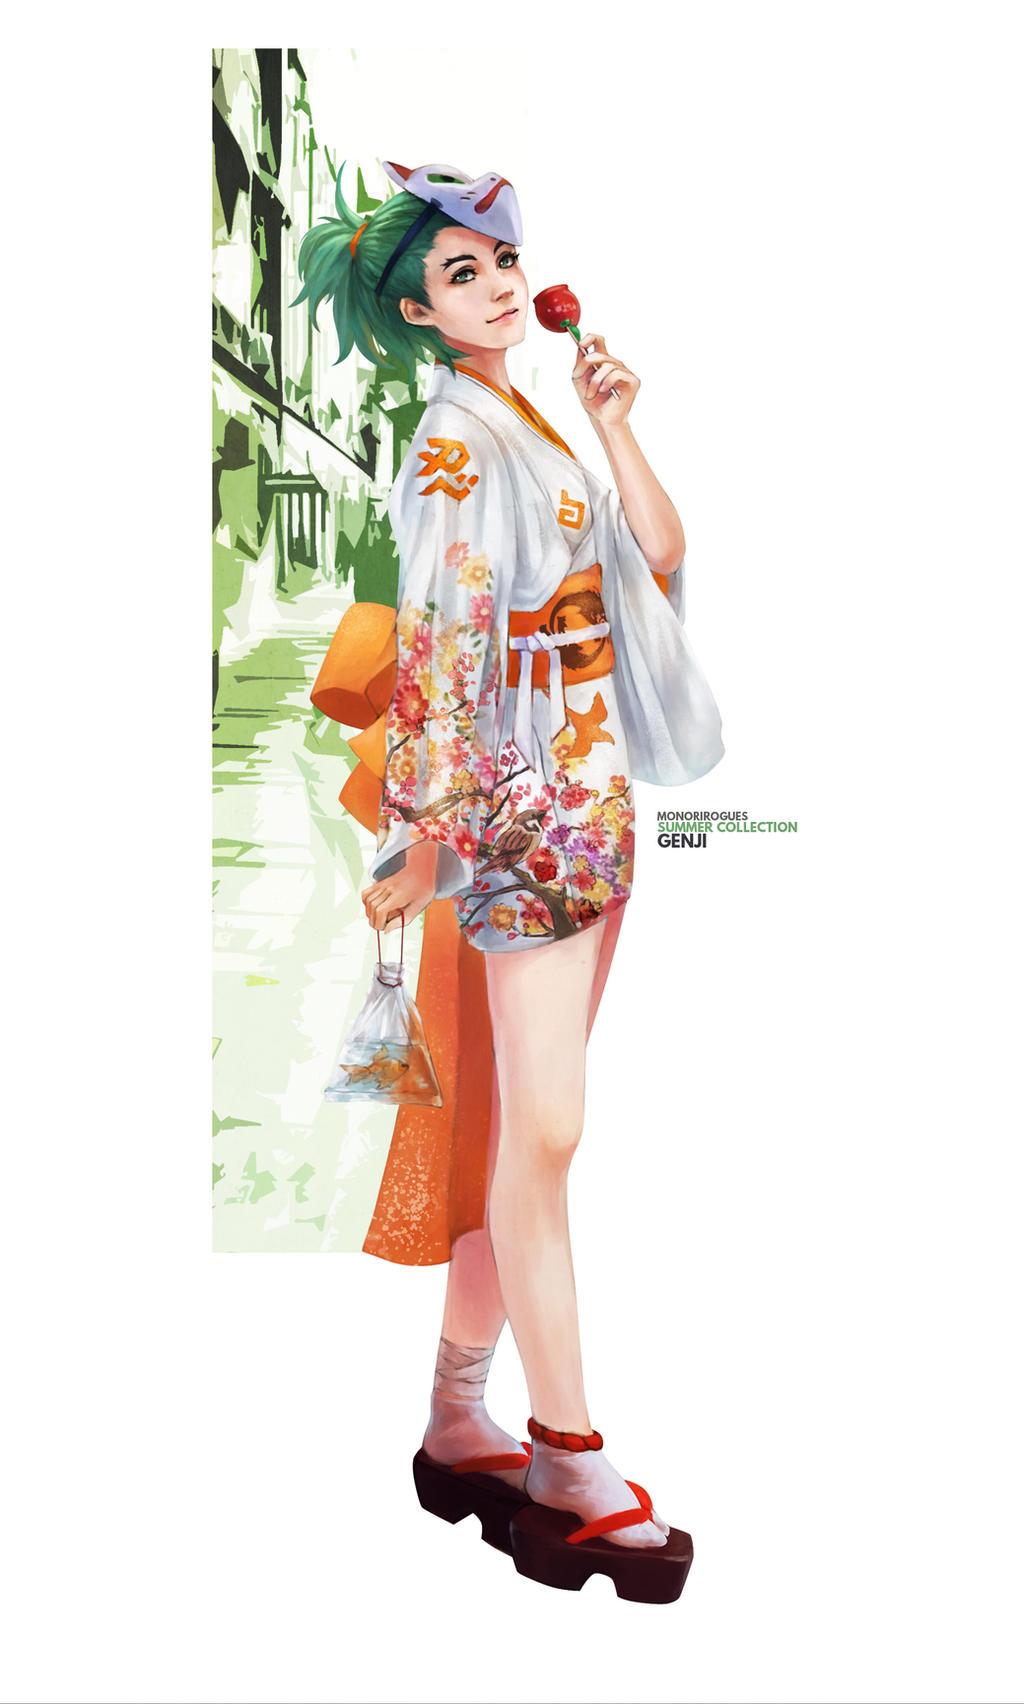 http://img15.deviantart.net/c7b5/i/2017/069/a/6/genji___summer_collection_by_monorirogue-db1skif.jpg